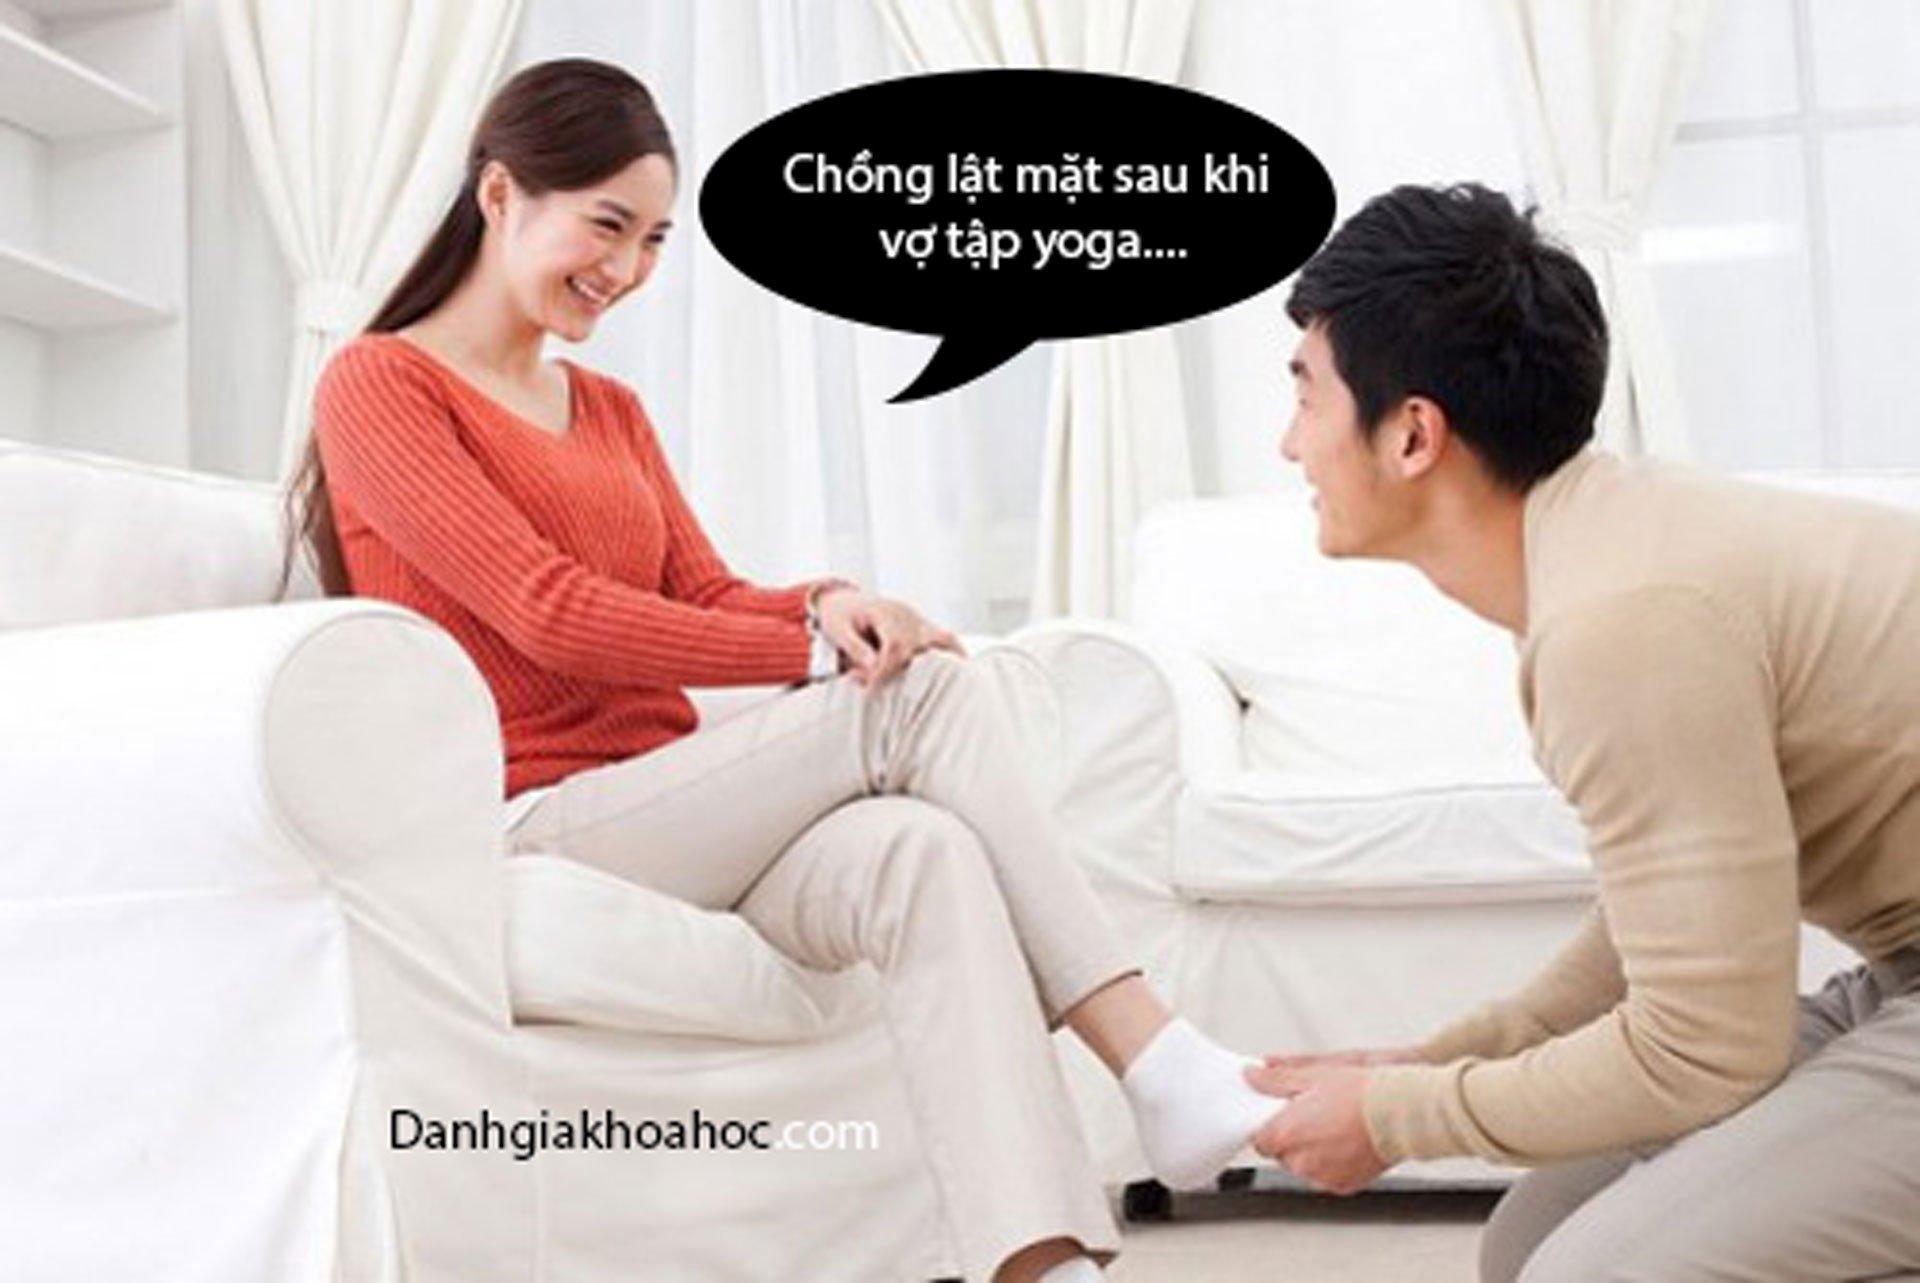 Chồng lật mặt sau khi vợ tập yoga....